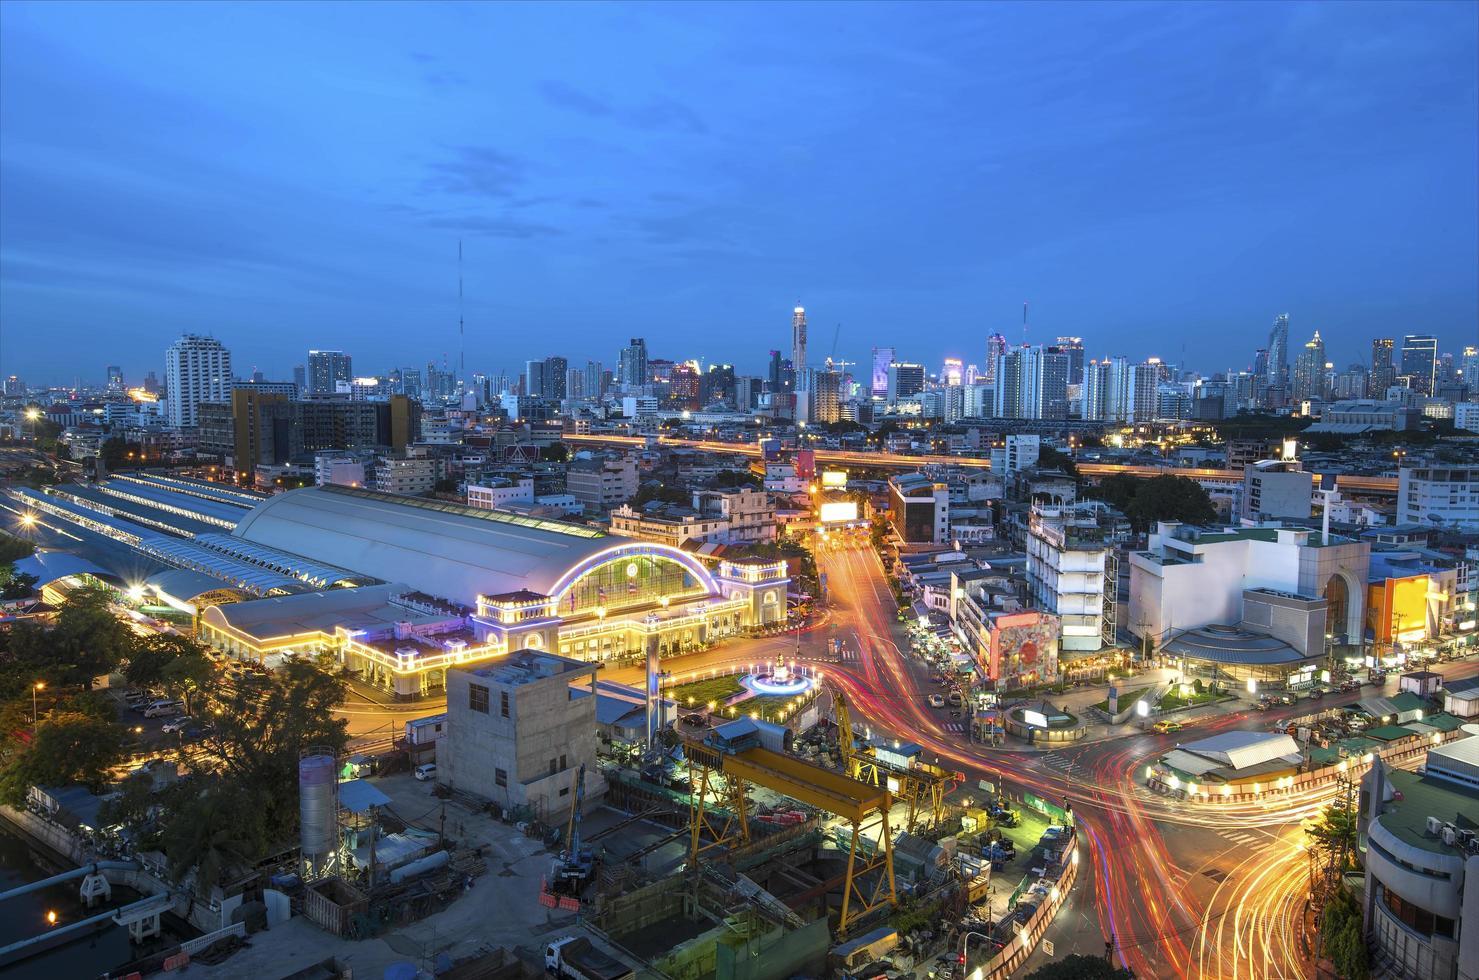 stazione ferroviaria di bangkok foto